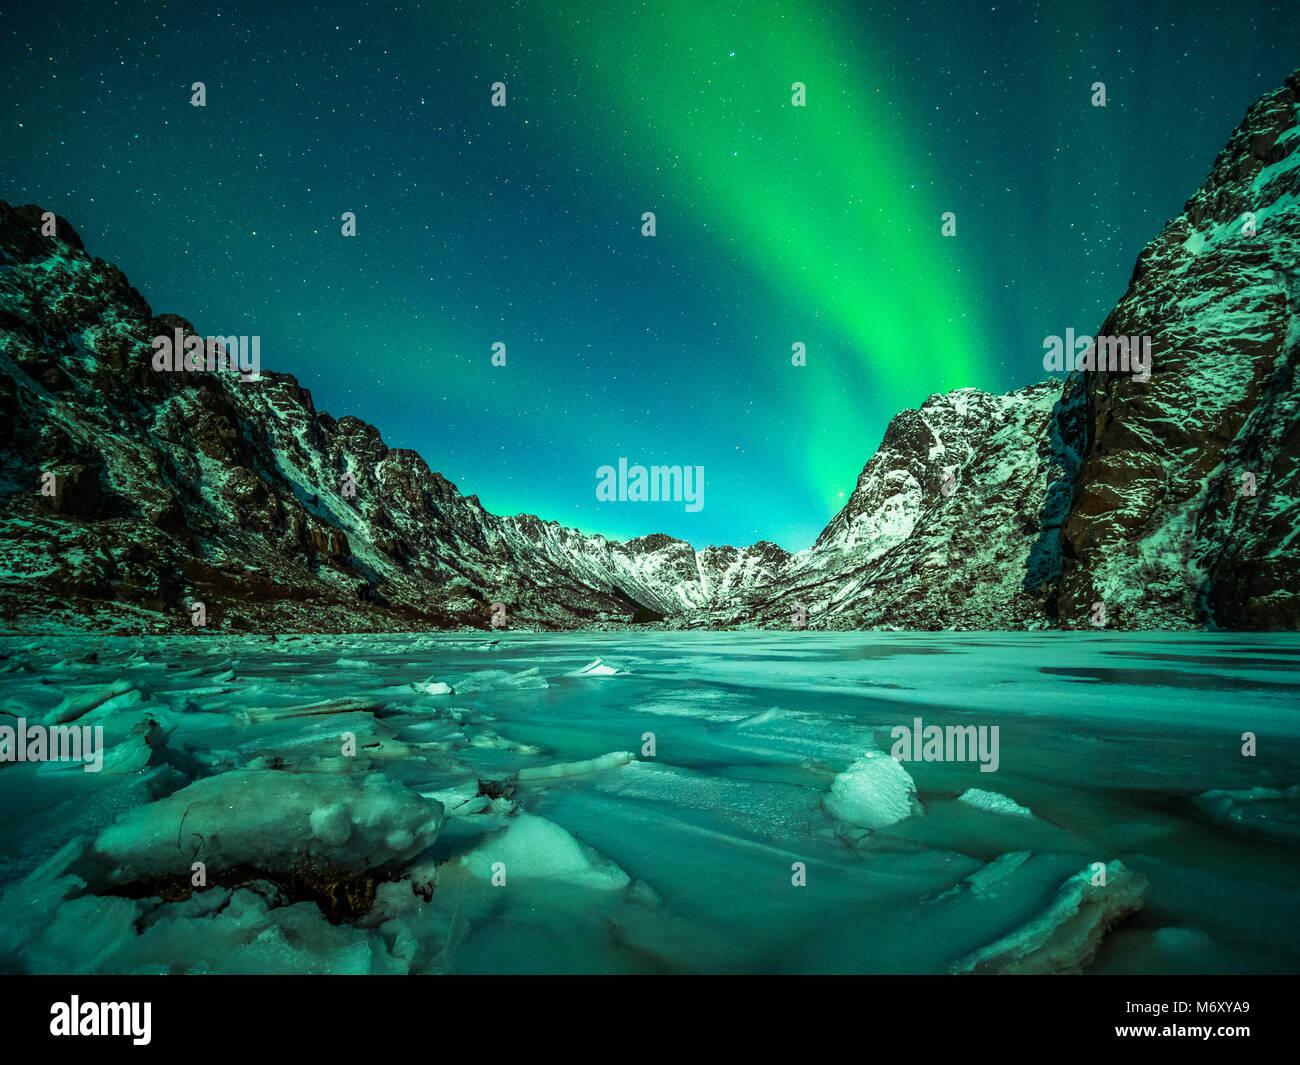 Northern light over the islands of Lofoten. - Stock Image